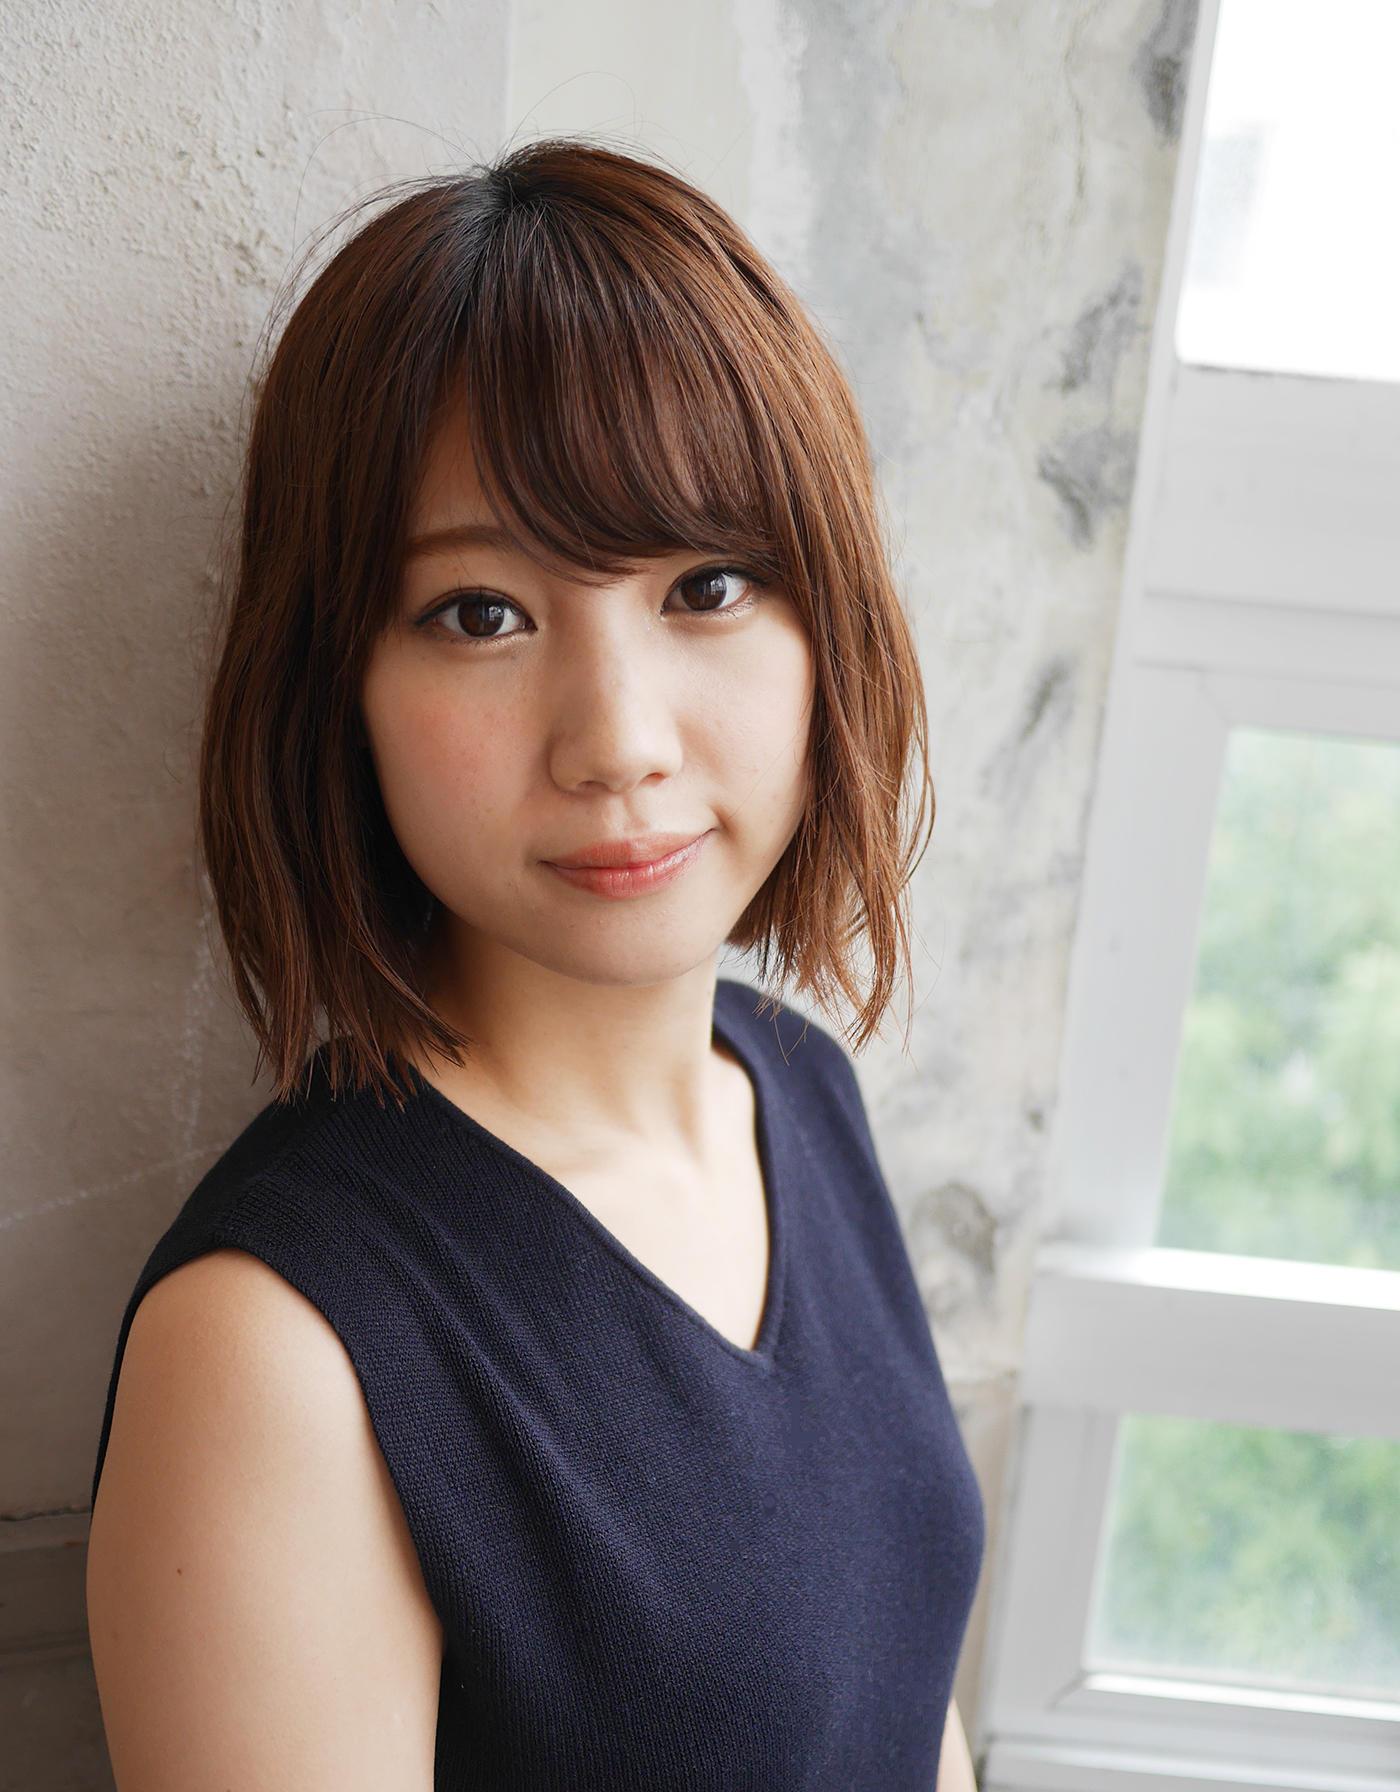 http://news.yoshimoto.co.jp/20160929162046-e77e226df63724ccb62a5cdee94a3a0124a75ffd.jpg